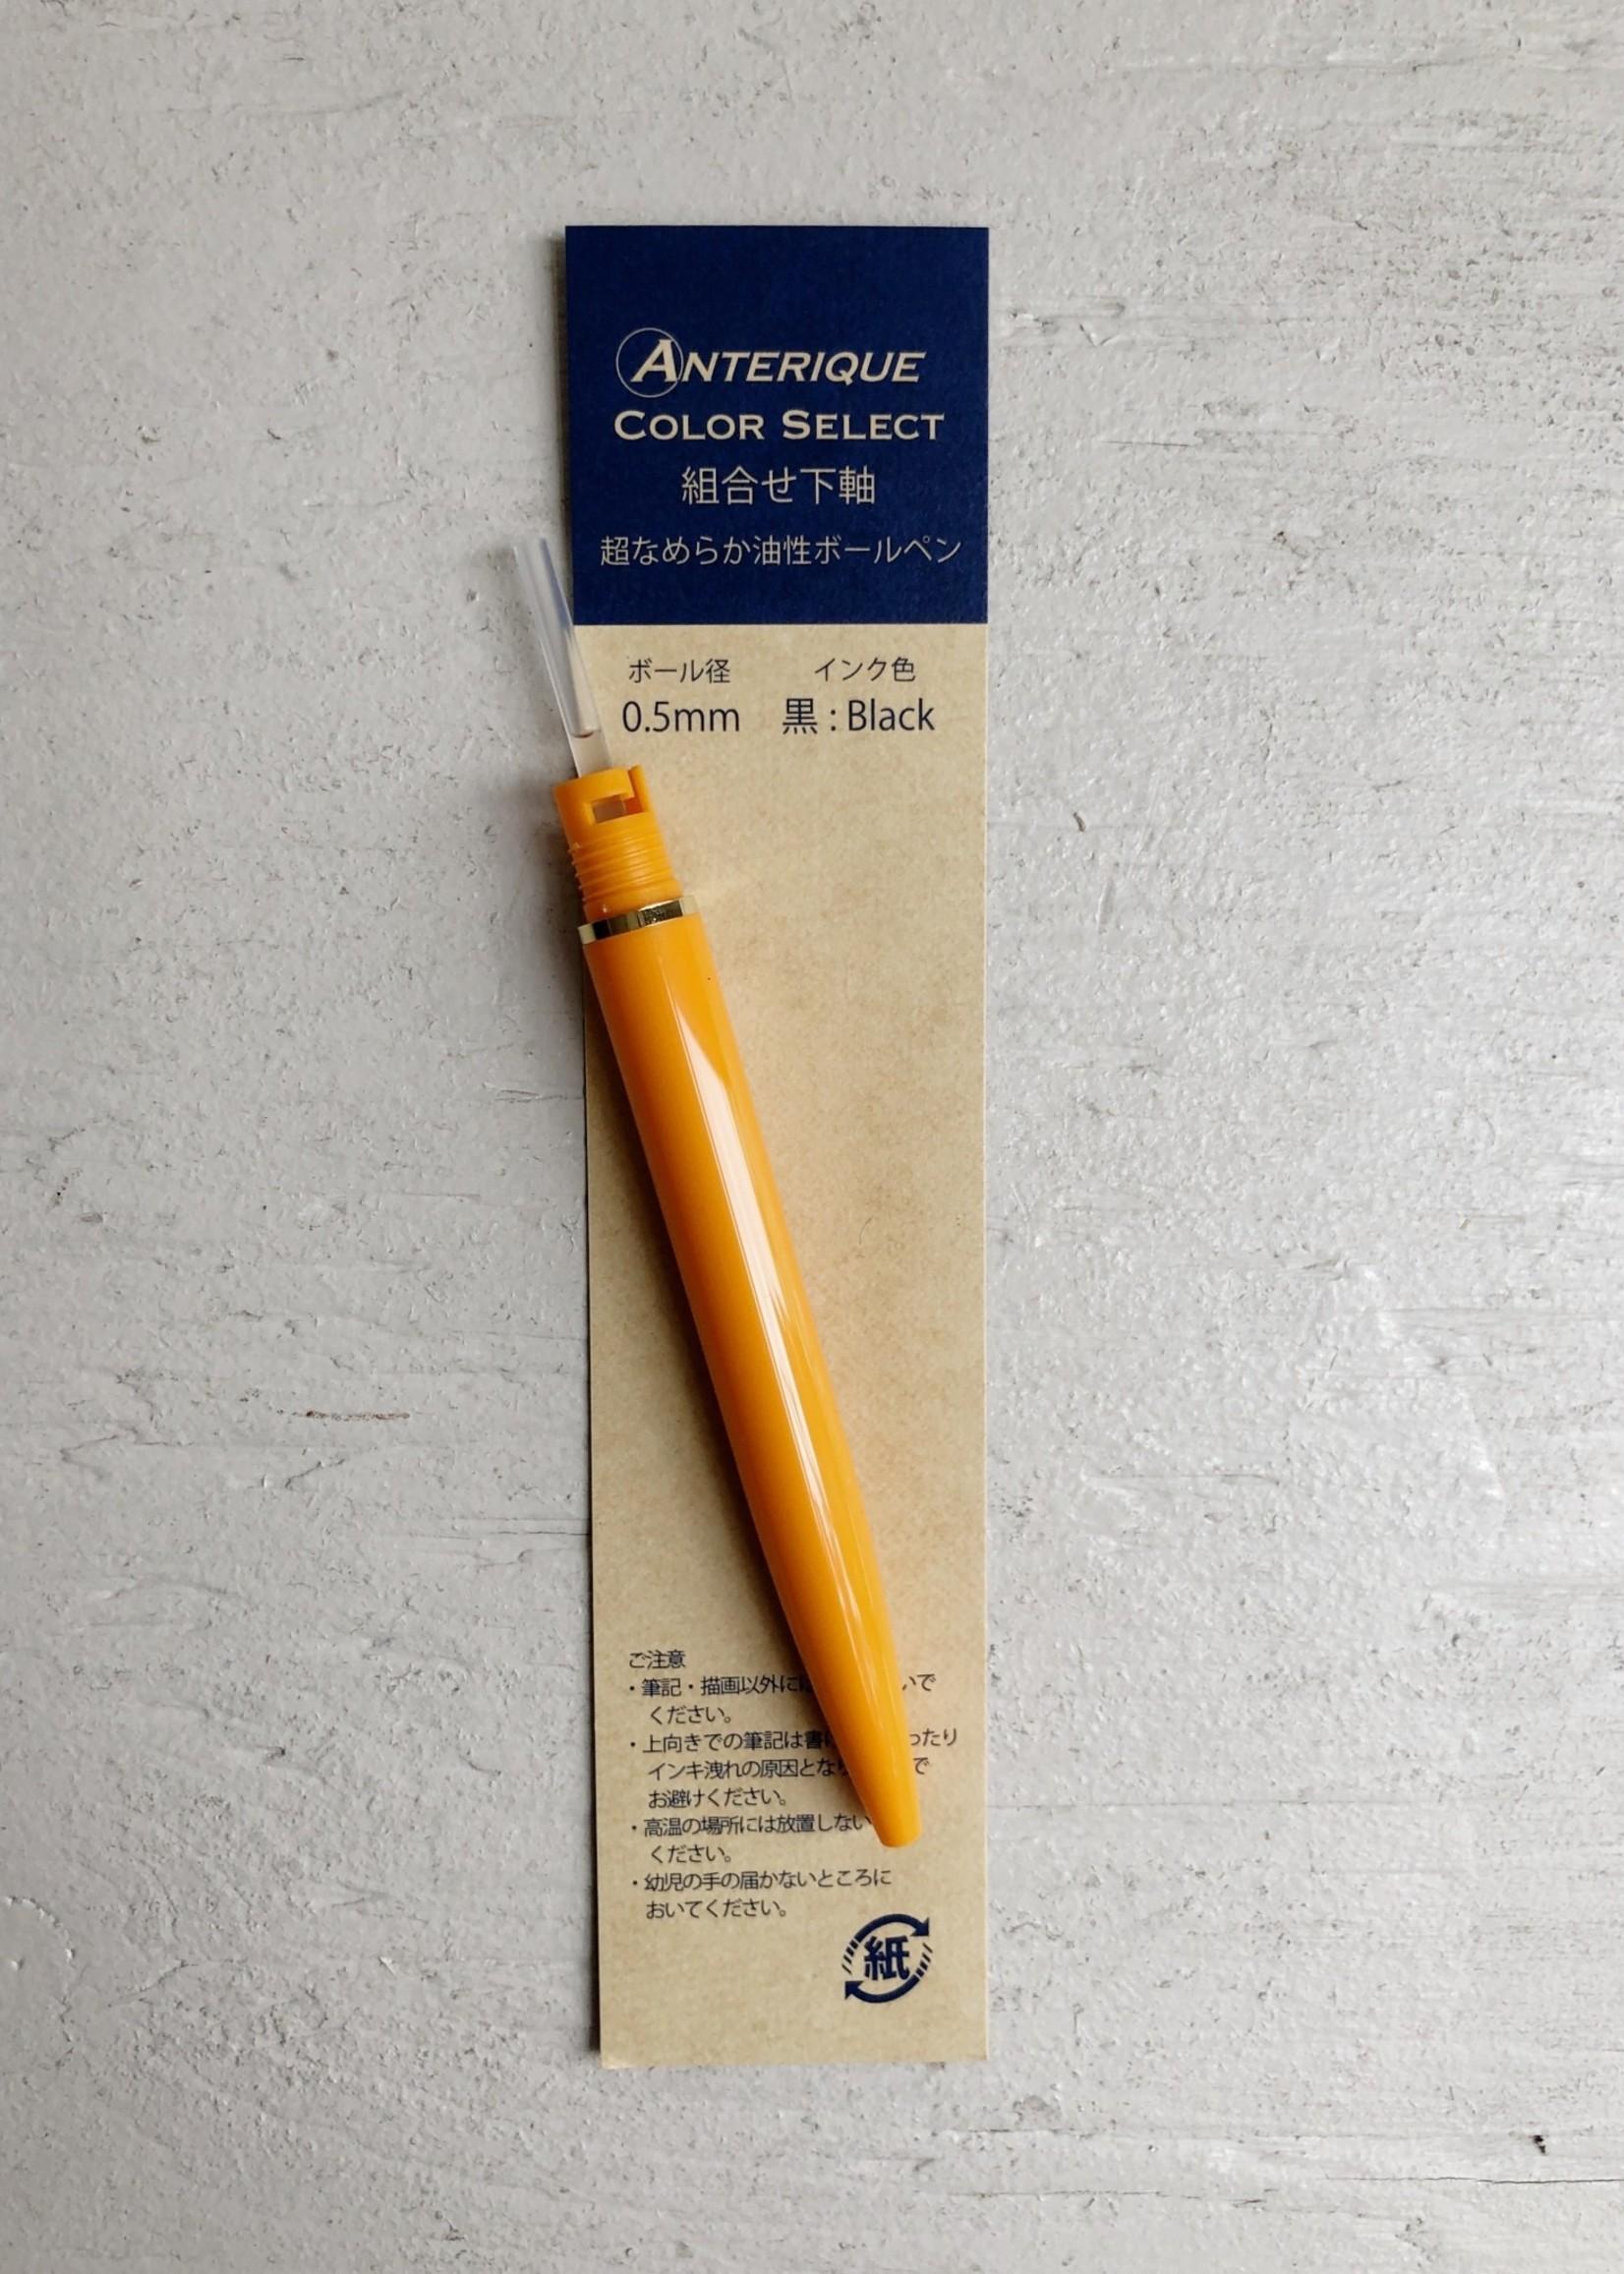 Anterique Lower Body Ballpoint Pen by Anterique